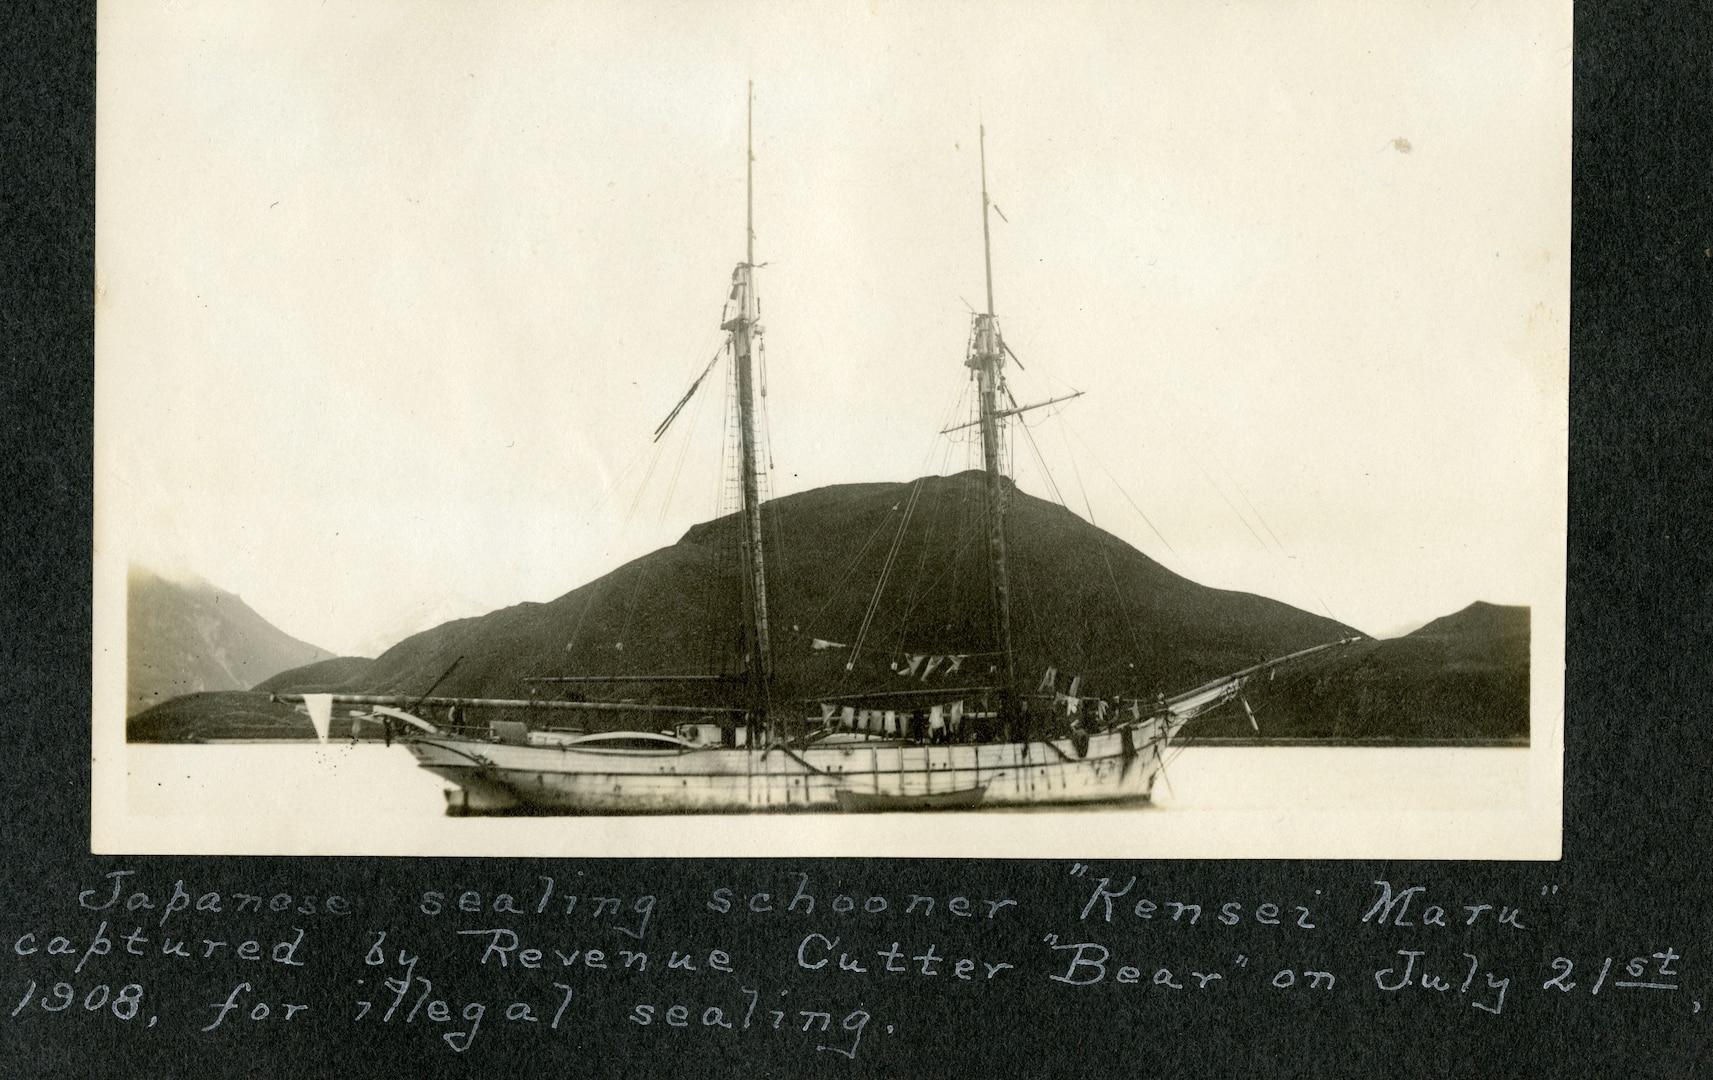 "Japanese sealing schooner ""Kensei Maru"" captured by Revenue Cutter ""Bear"" on July 21st, 1908, for illegal sealing."